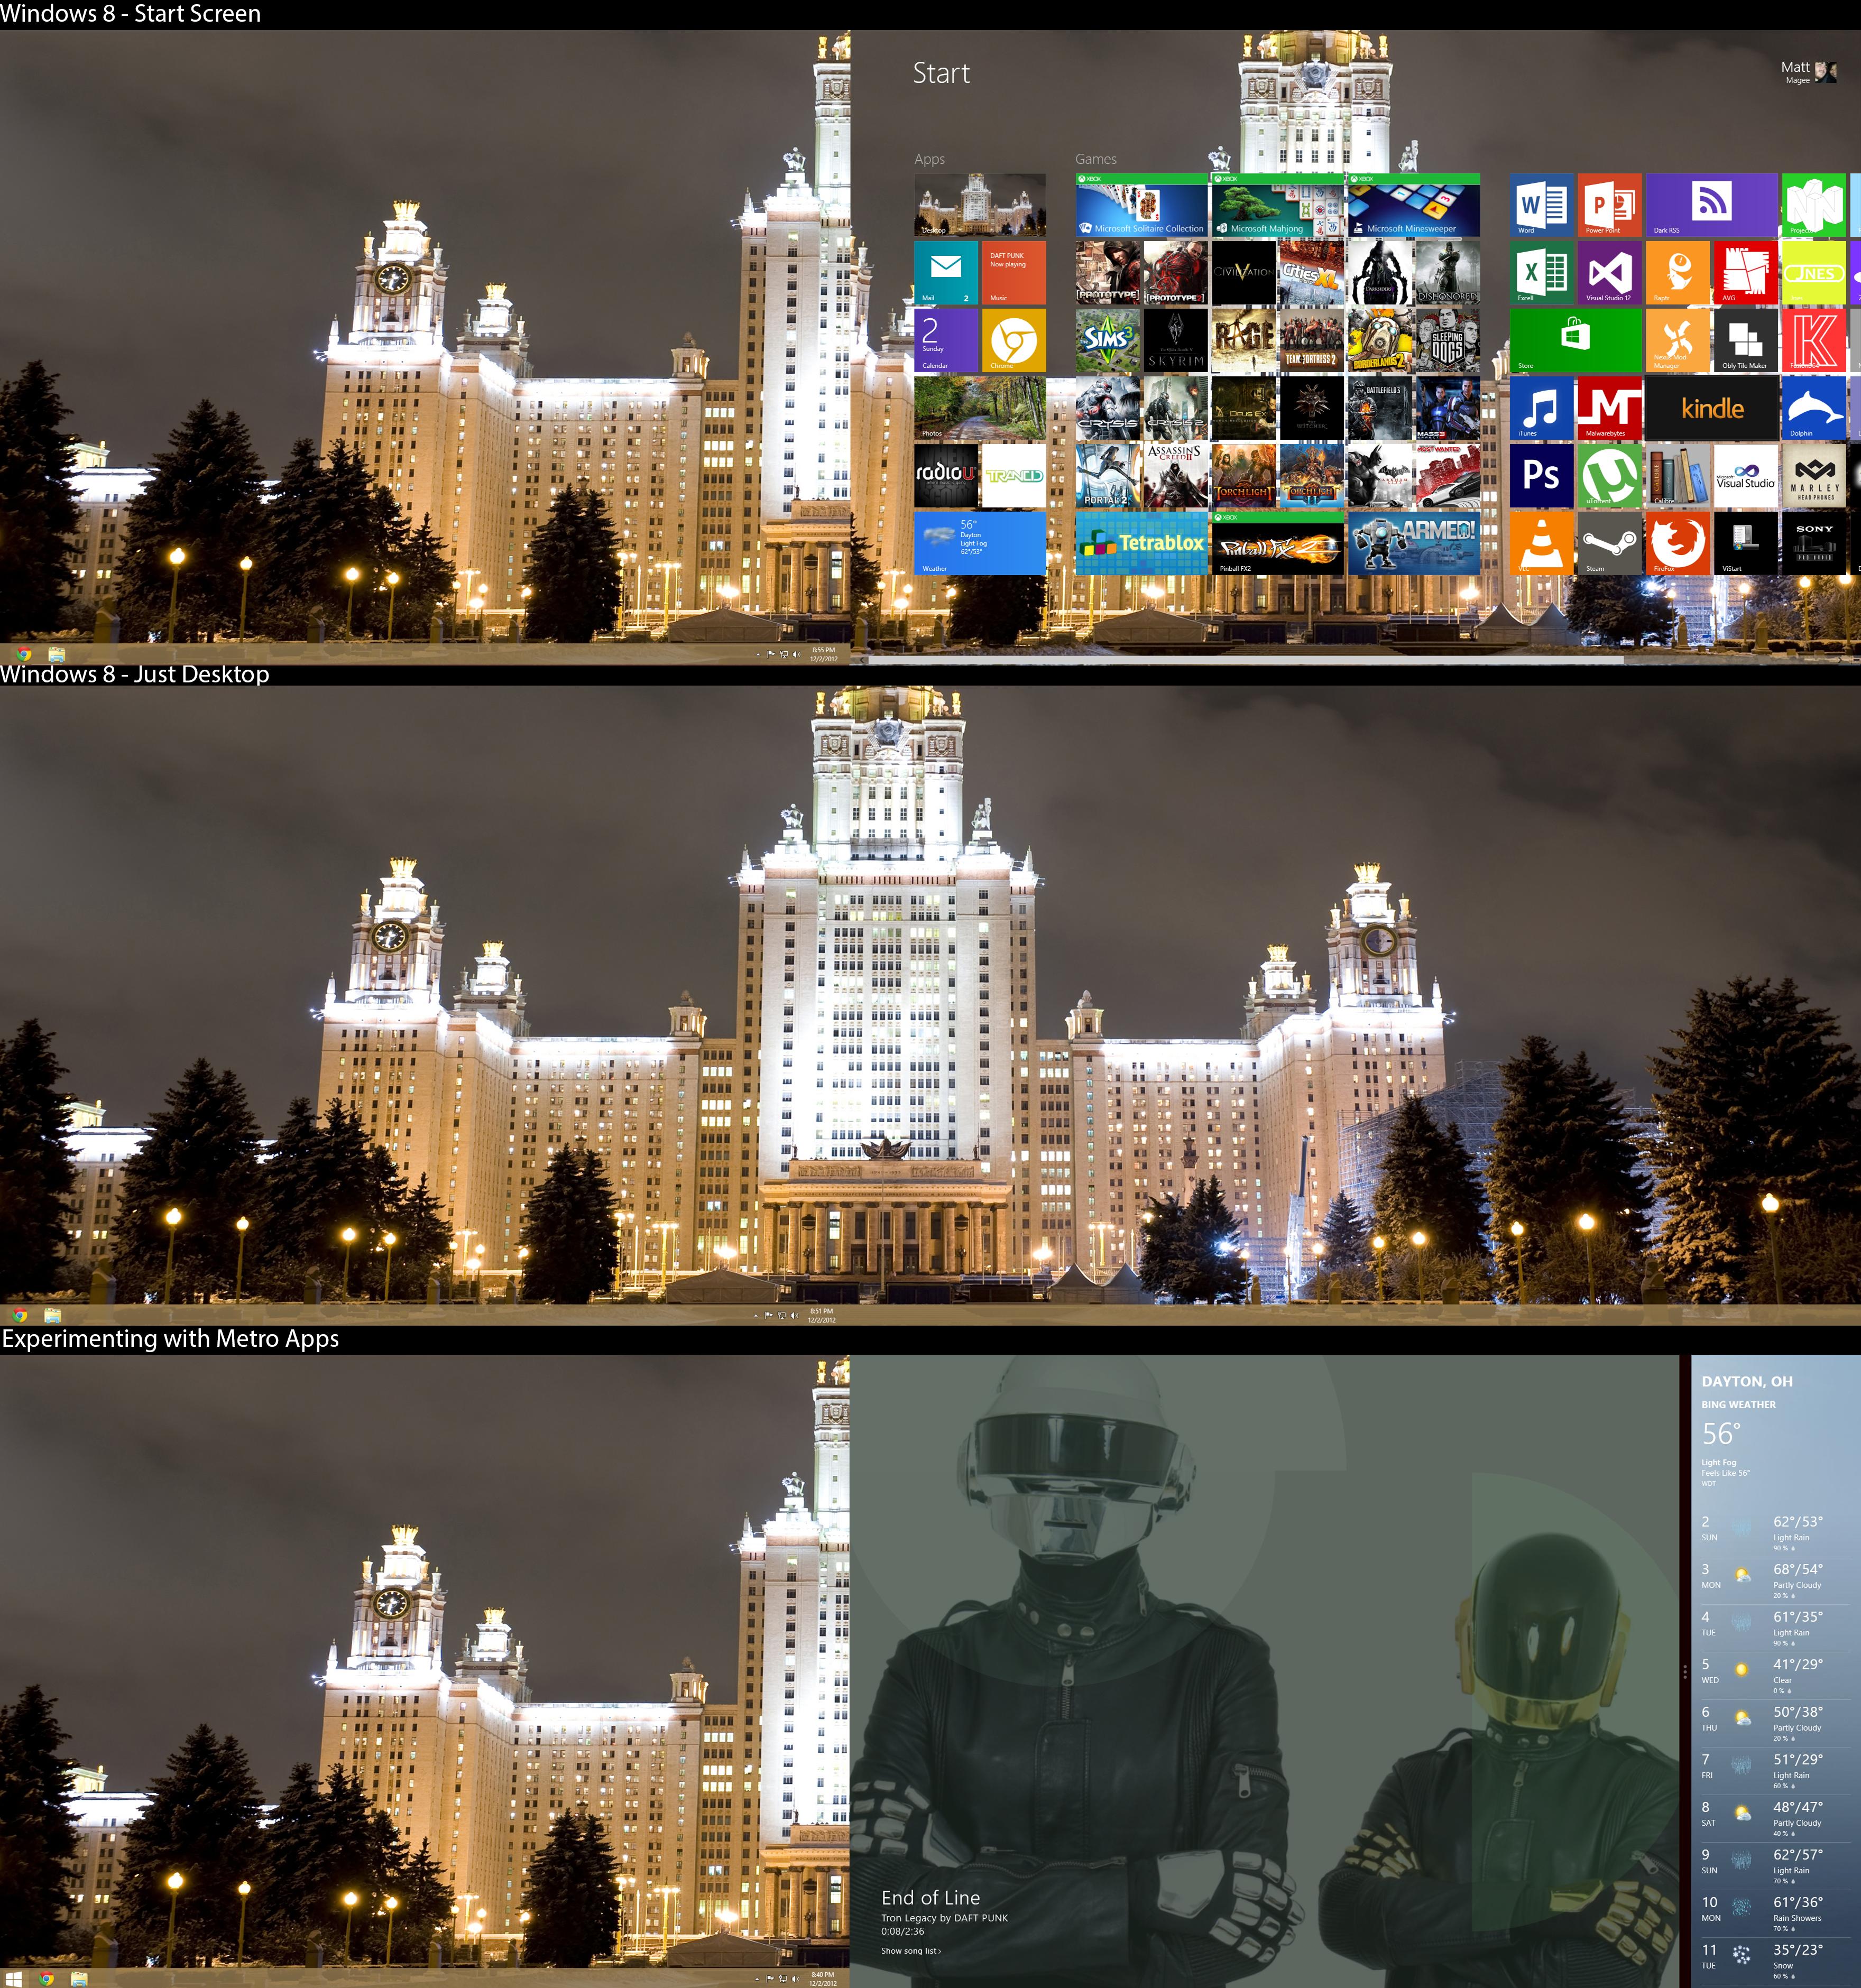 Desktop for December 2012 (Windows 8)